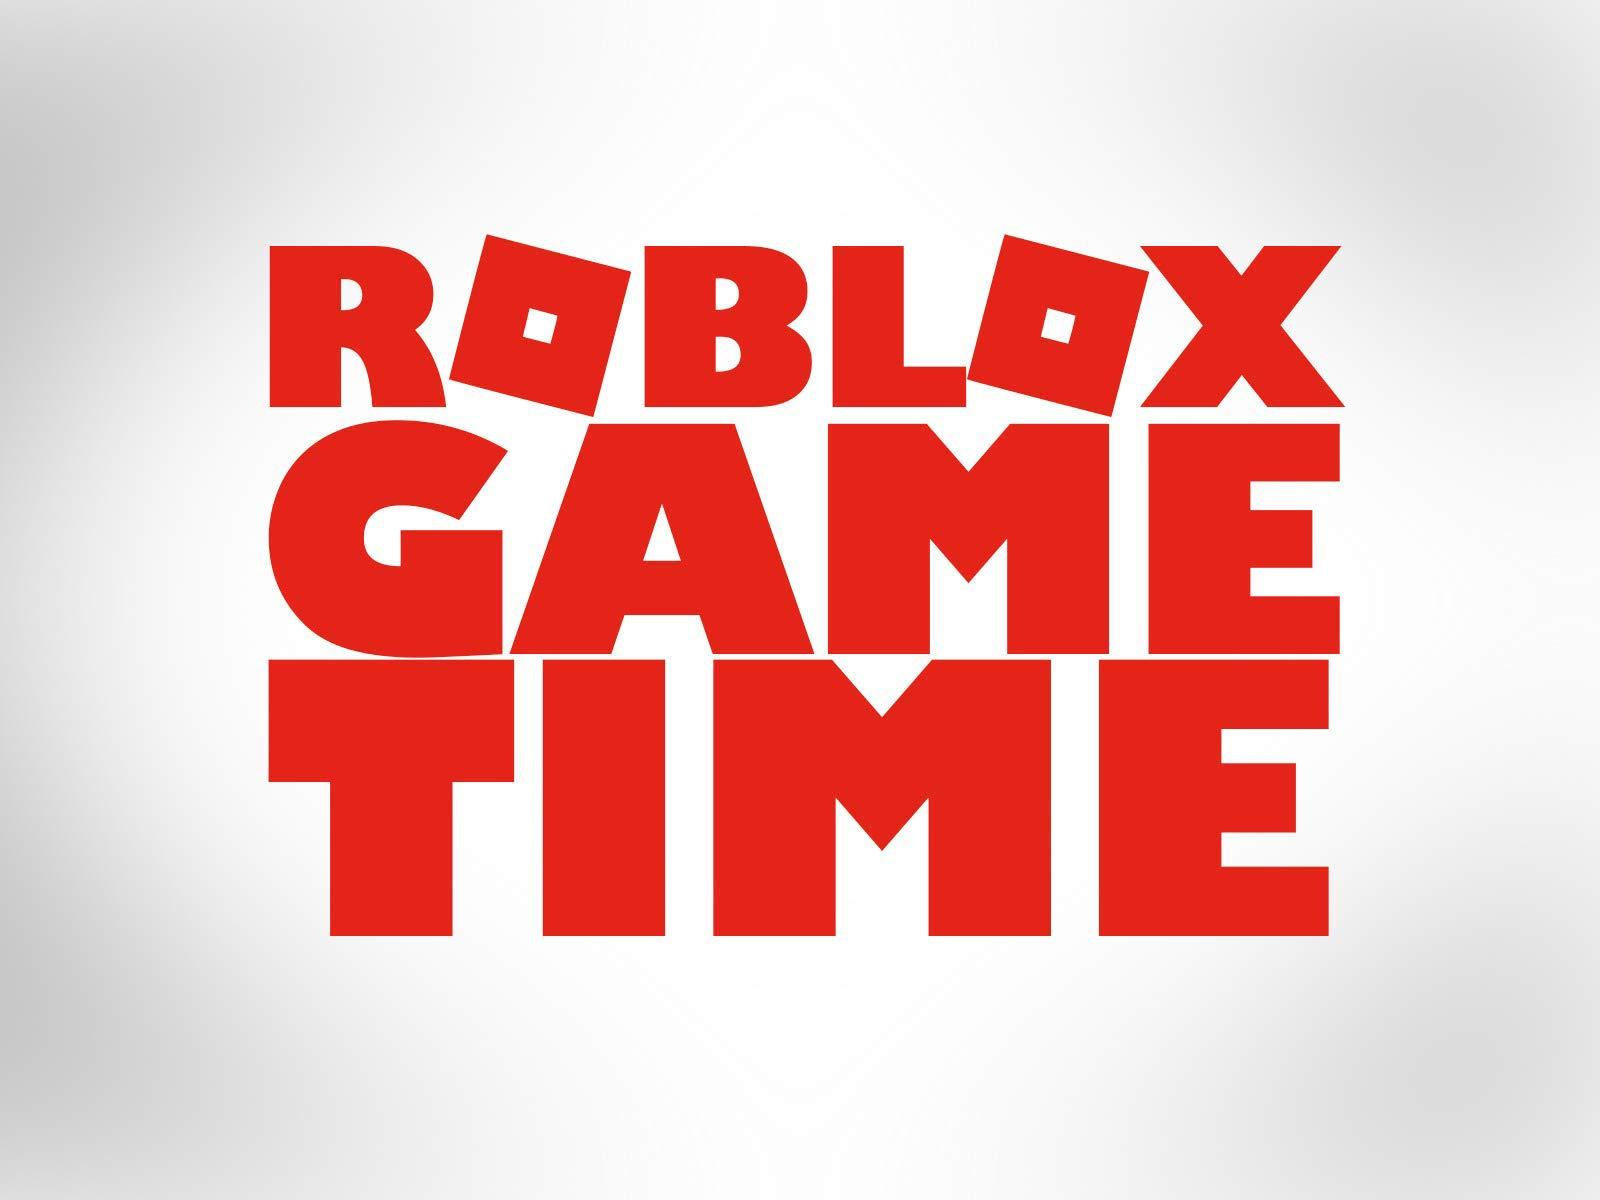 Dont Download Free Robux Item Glitch - Berkshireregion